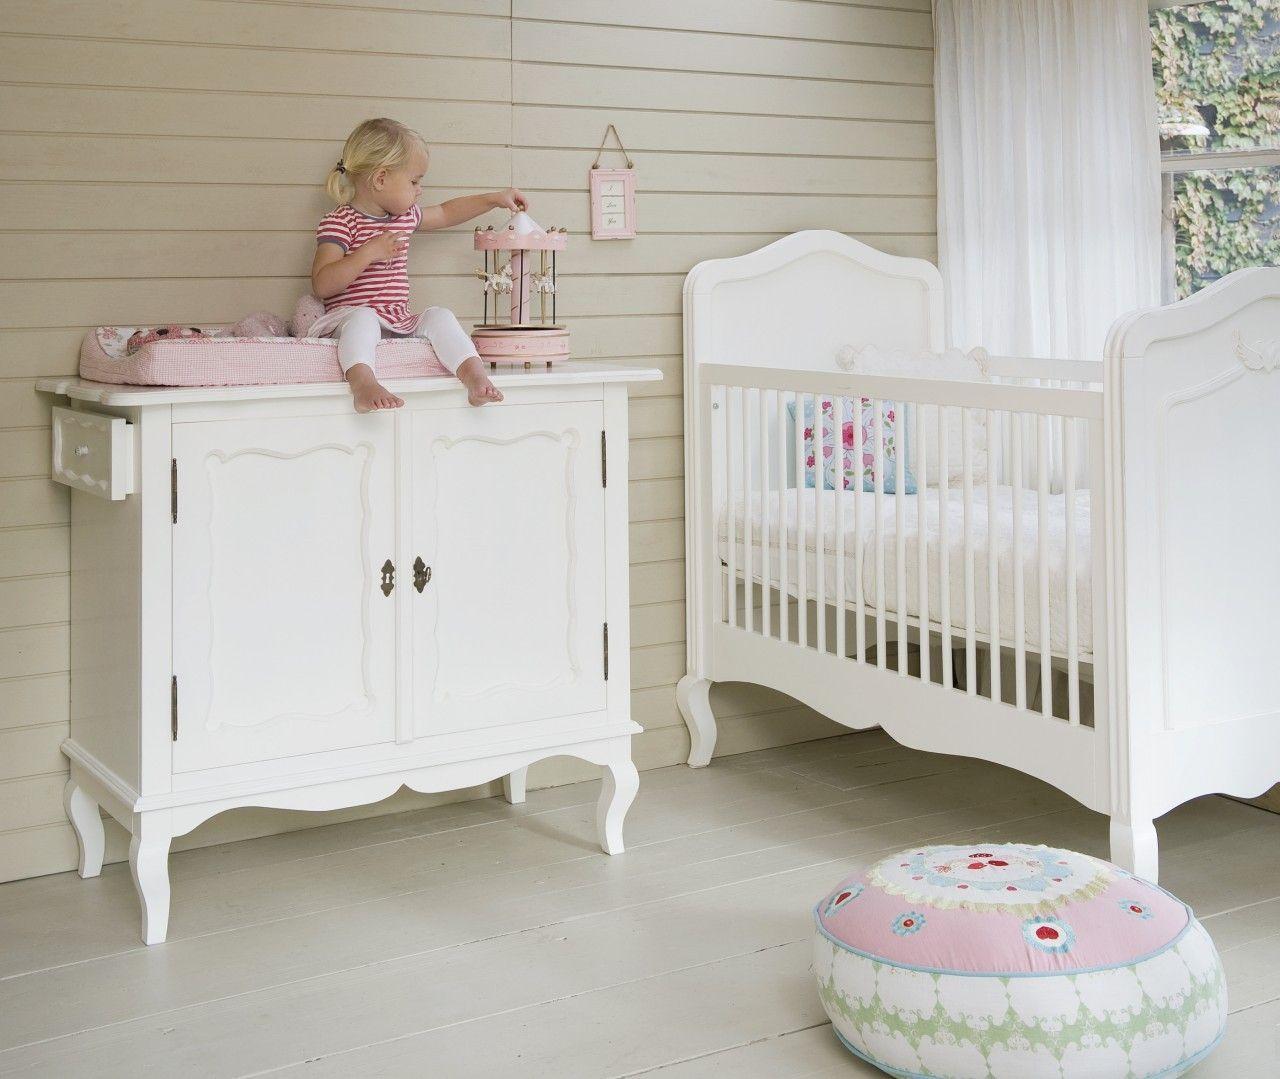 Best Kitchen Gallery: Designer Nursery Furniture French Girls Cot Designer Painted of Designer Baby Rooms  on rachelxblog.com